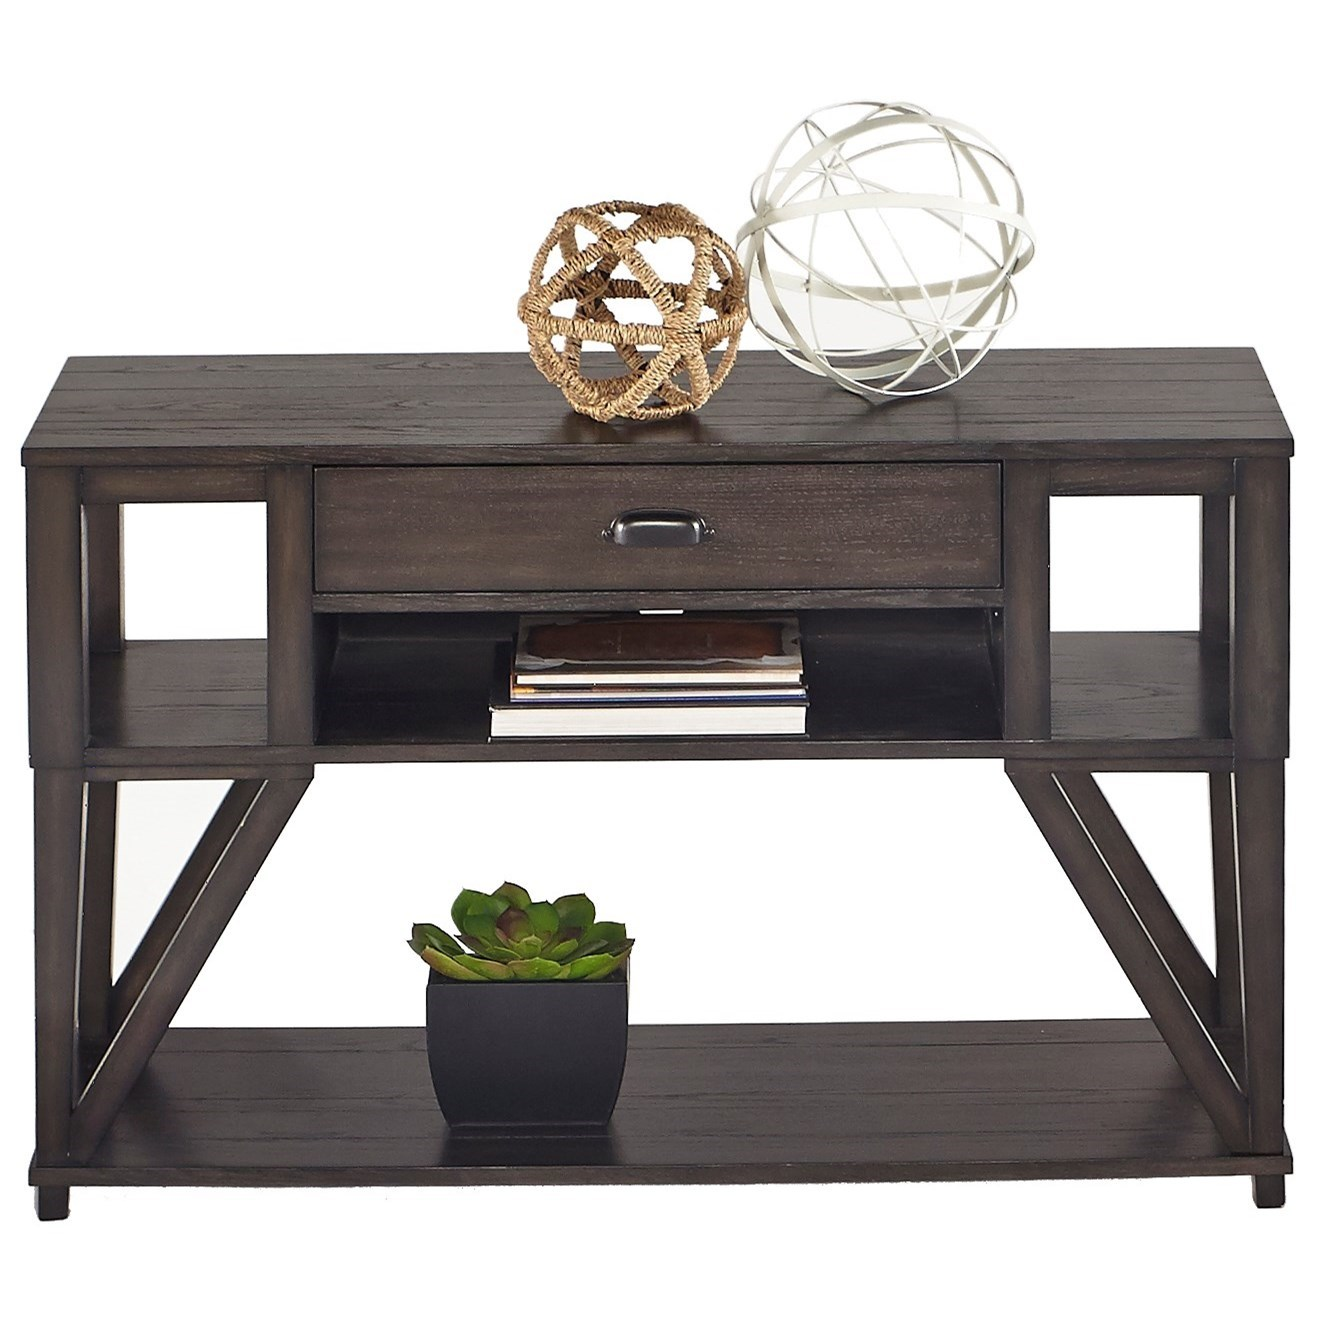 Progressive Furniture Consort Sofa/Console Table - Item Number: T425-05